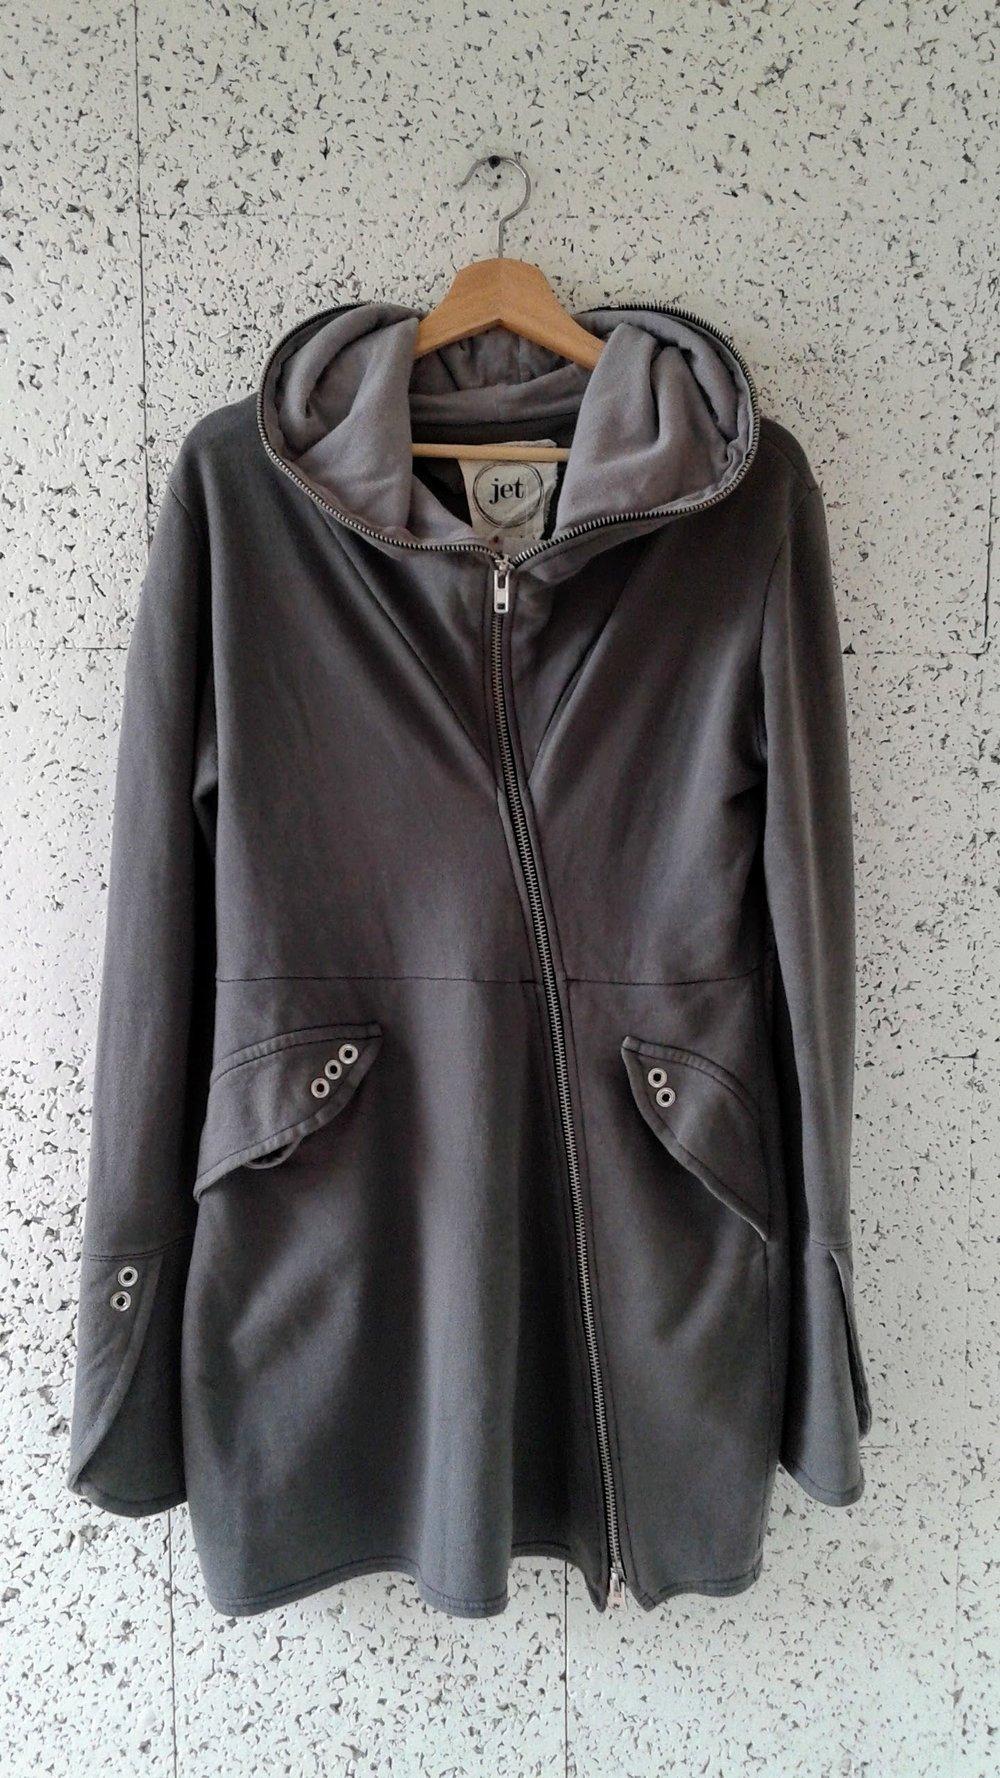 Jet jacket; Size M, $48